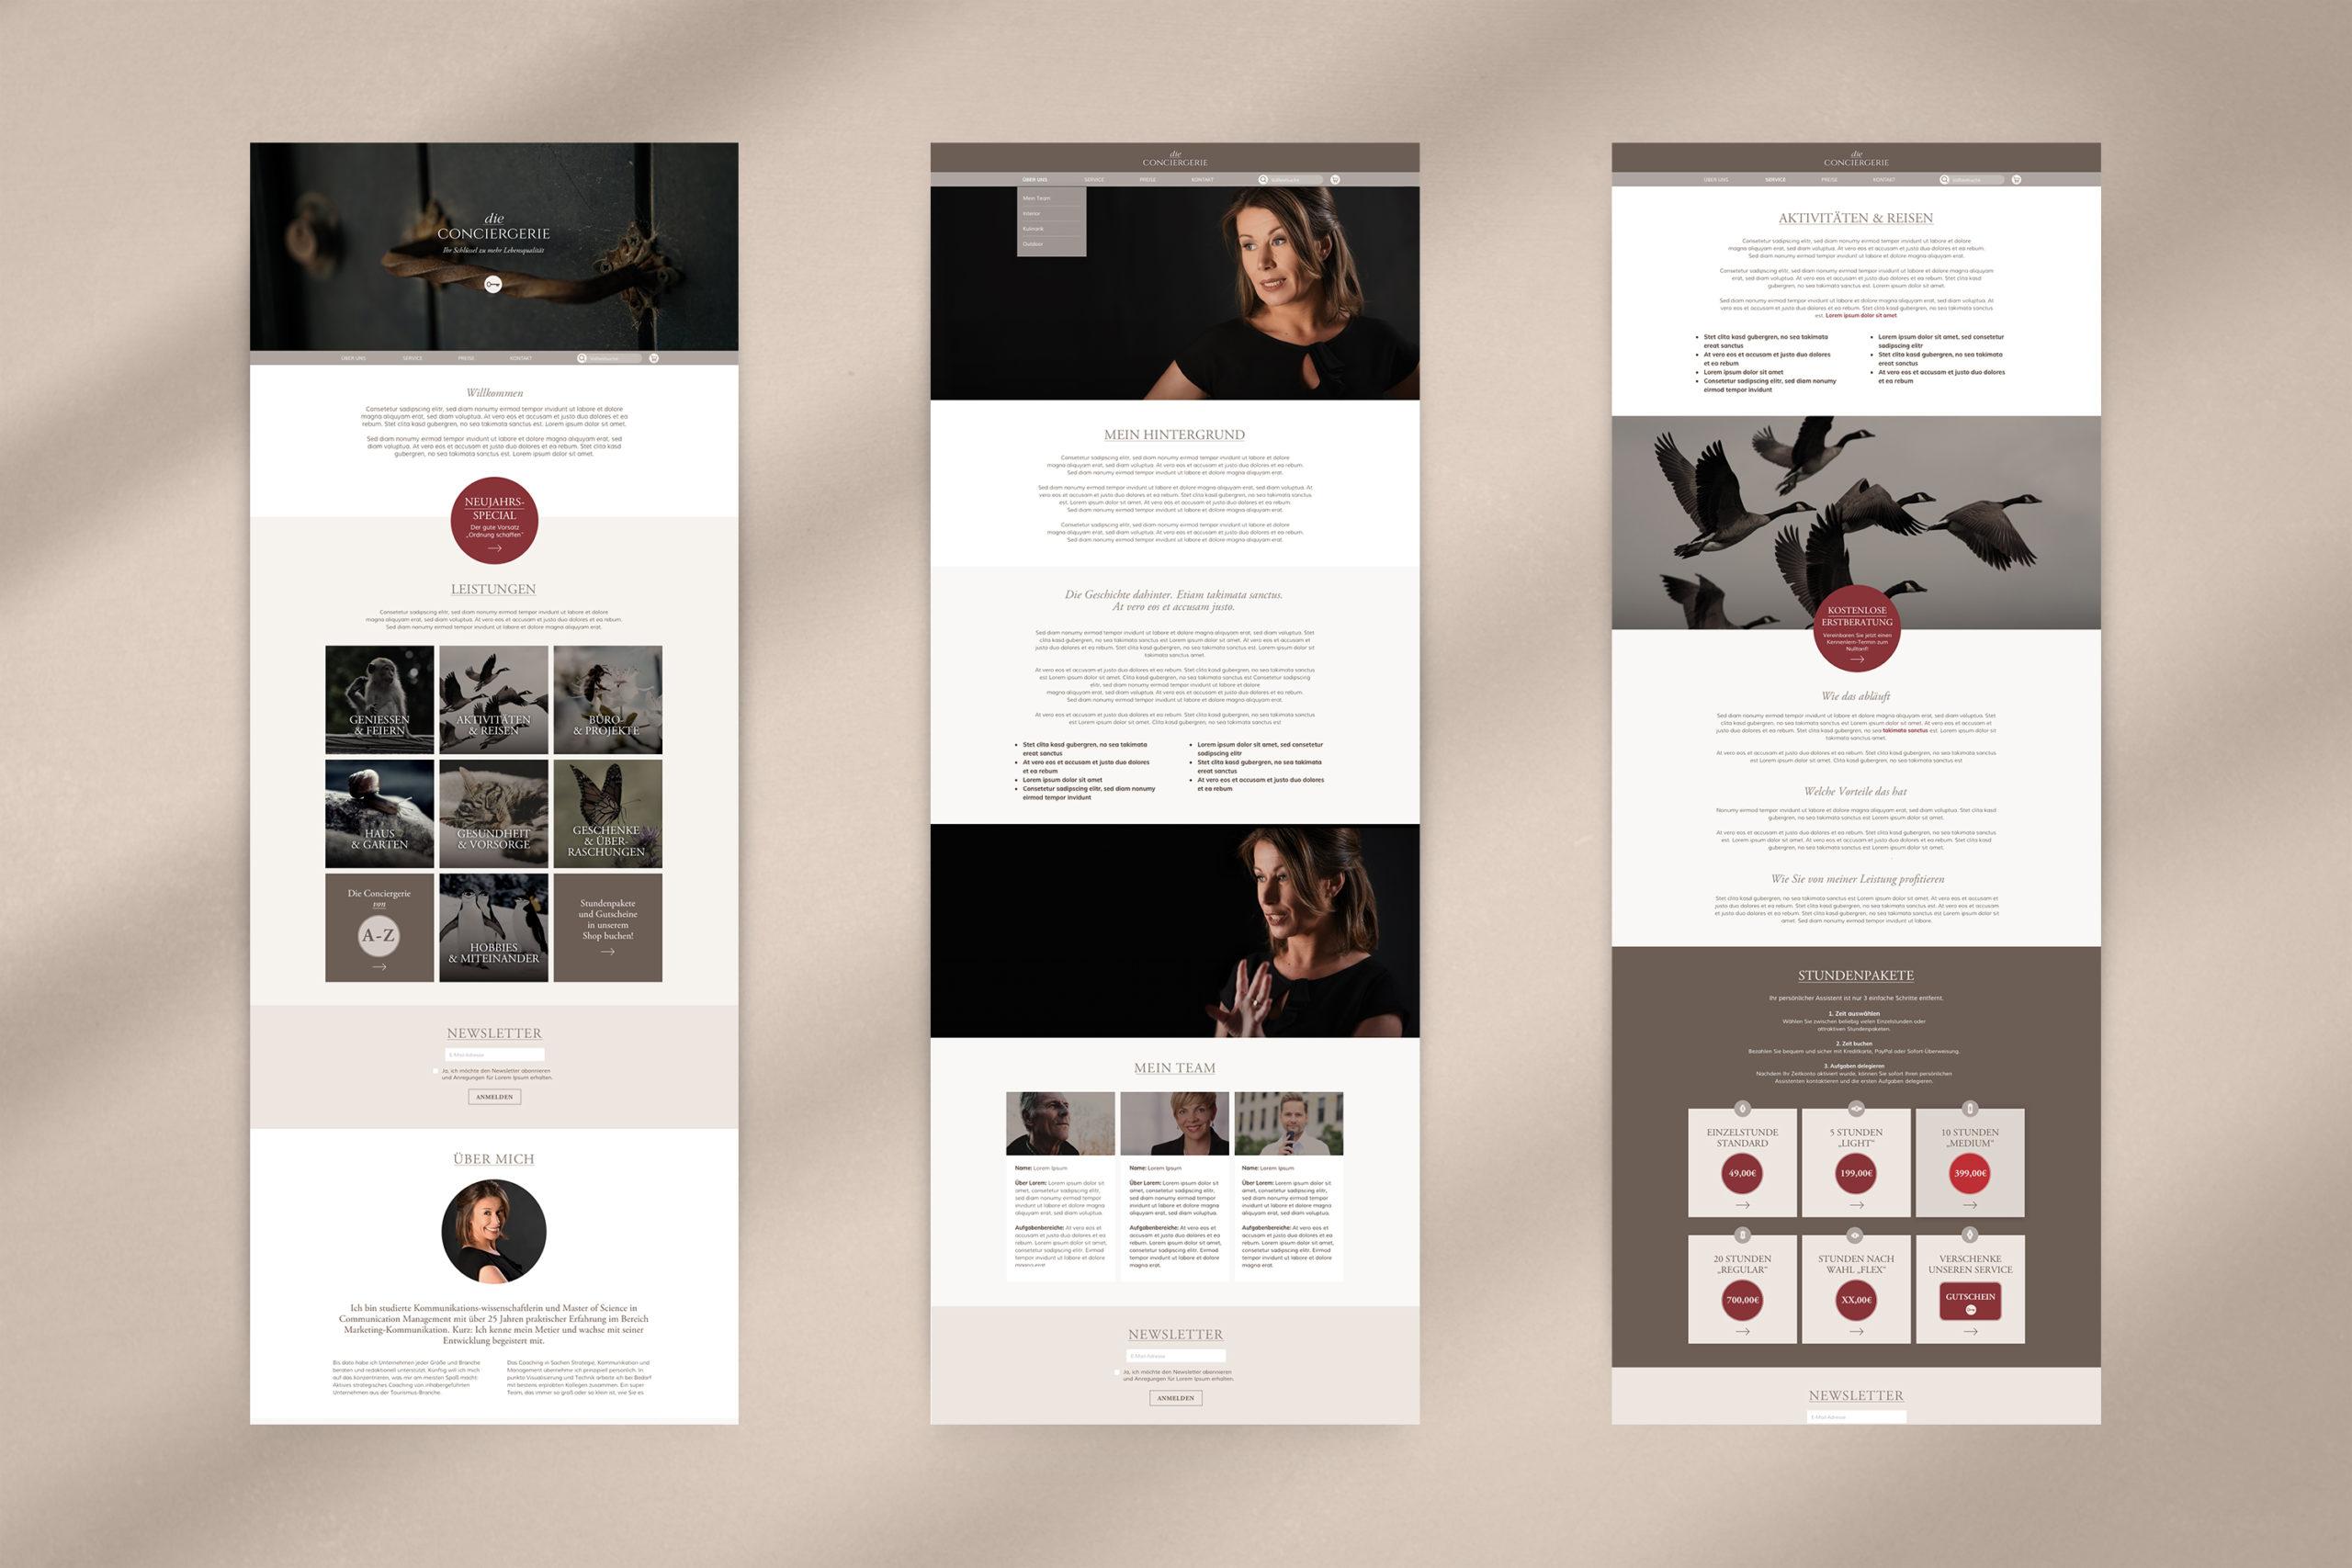 Die Conciergerie / Webdesign